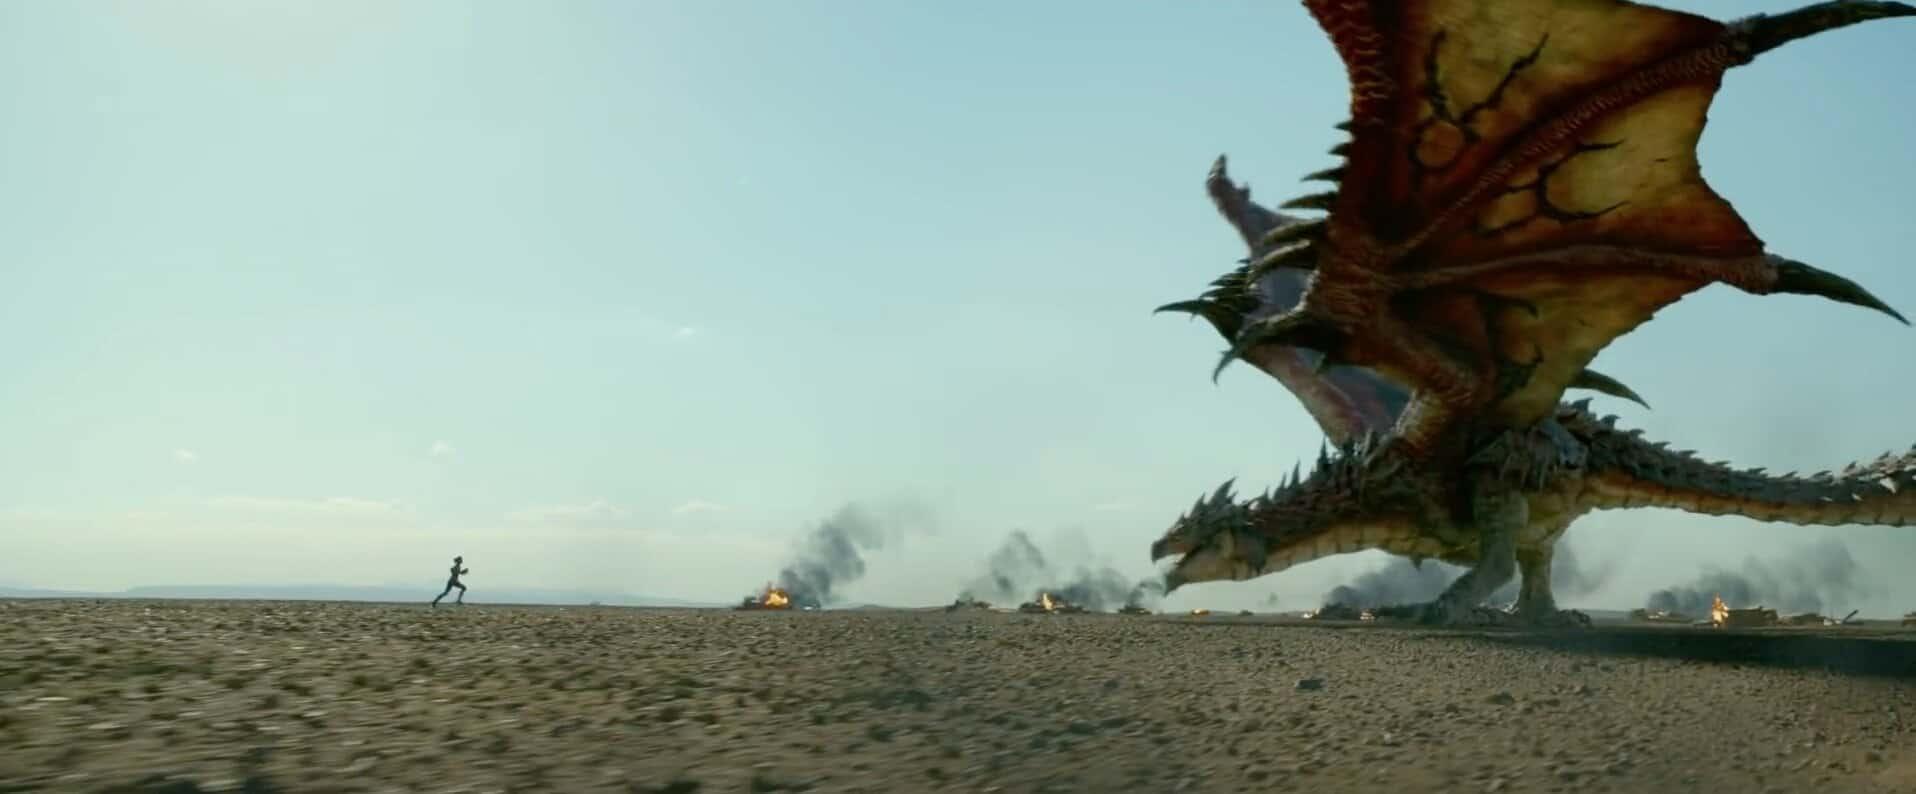 Monster Hunter : Milla Jovovich affronte un Rathalos dans la bande-annonce  du film